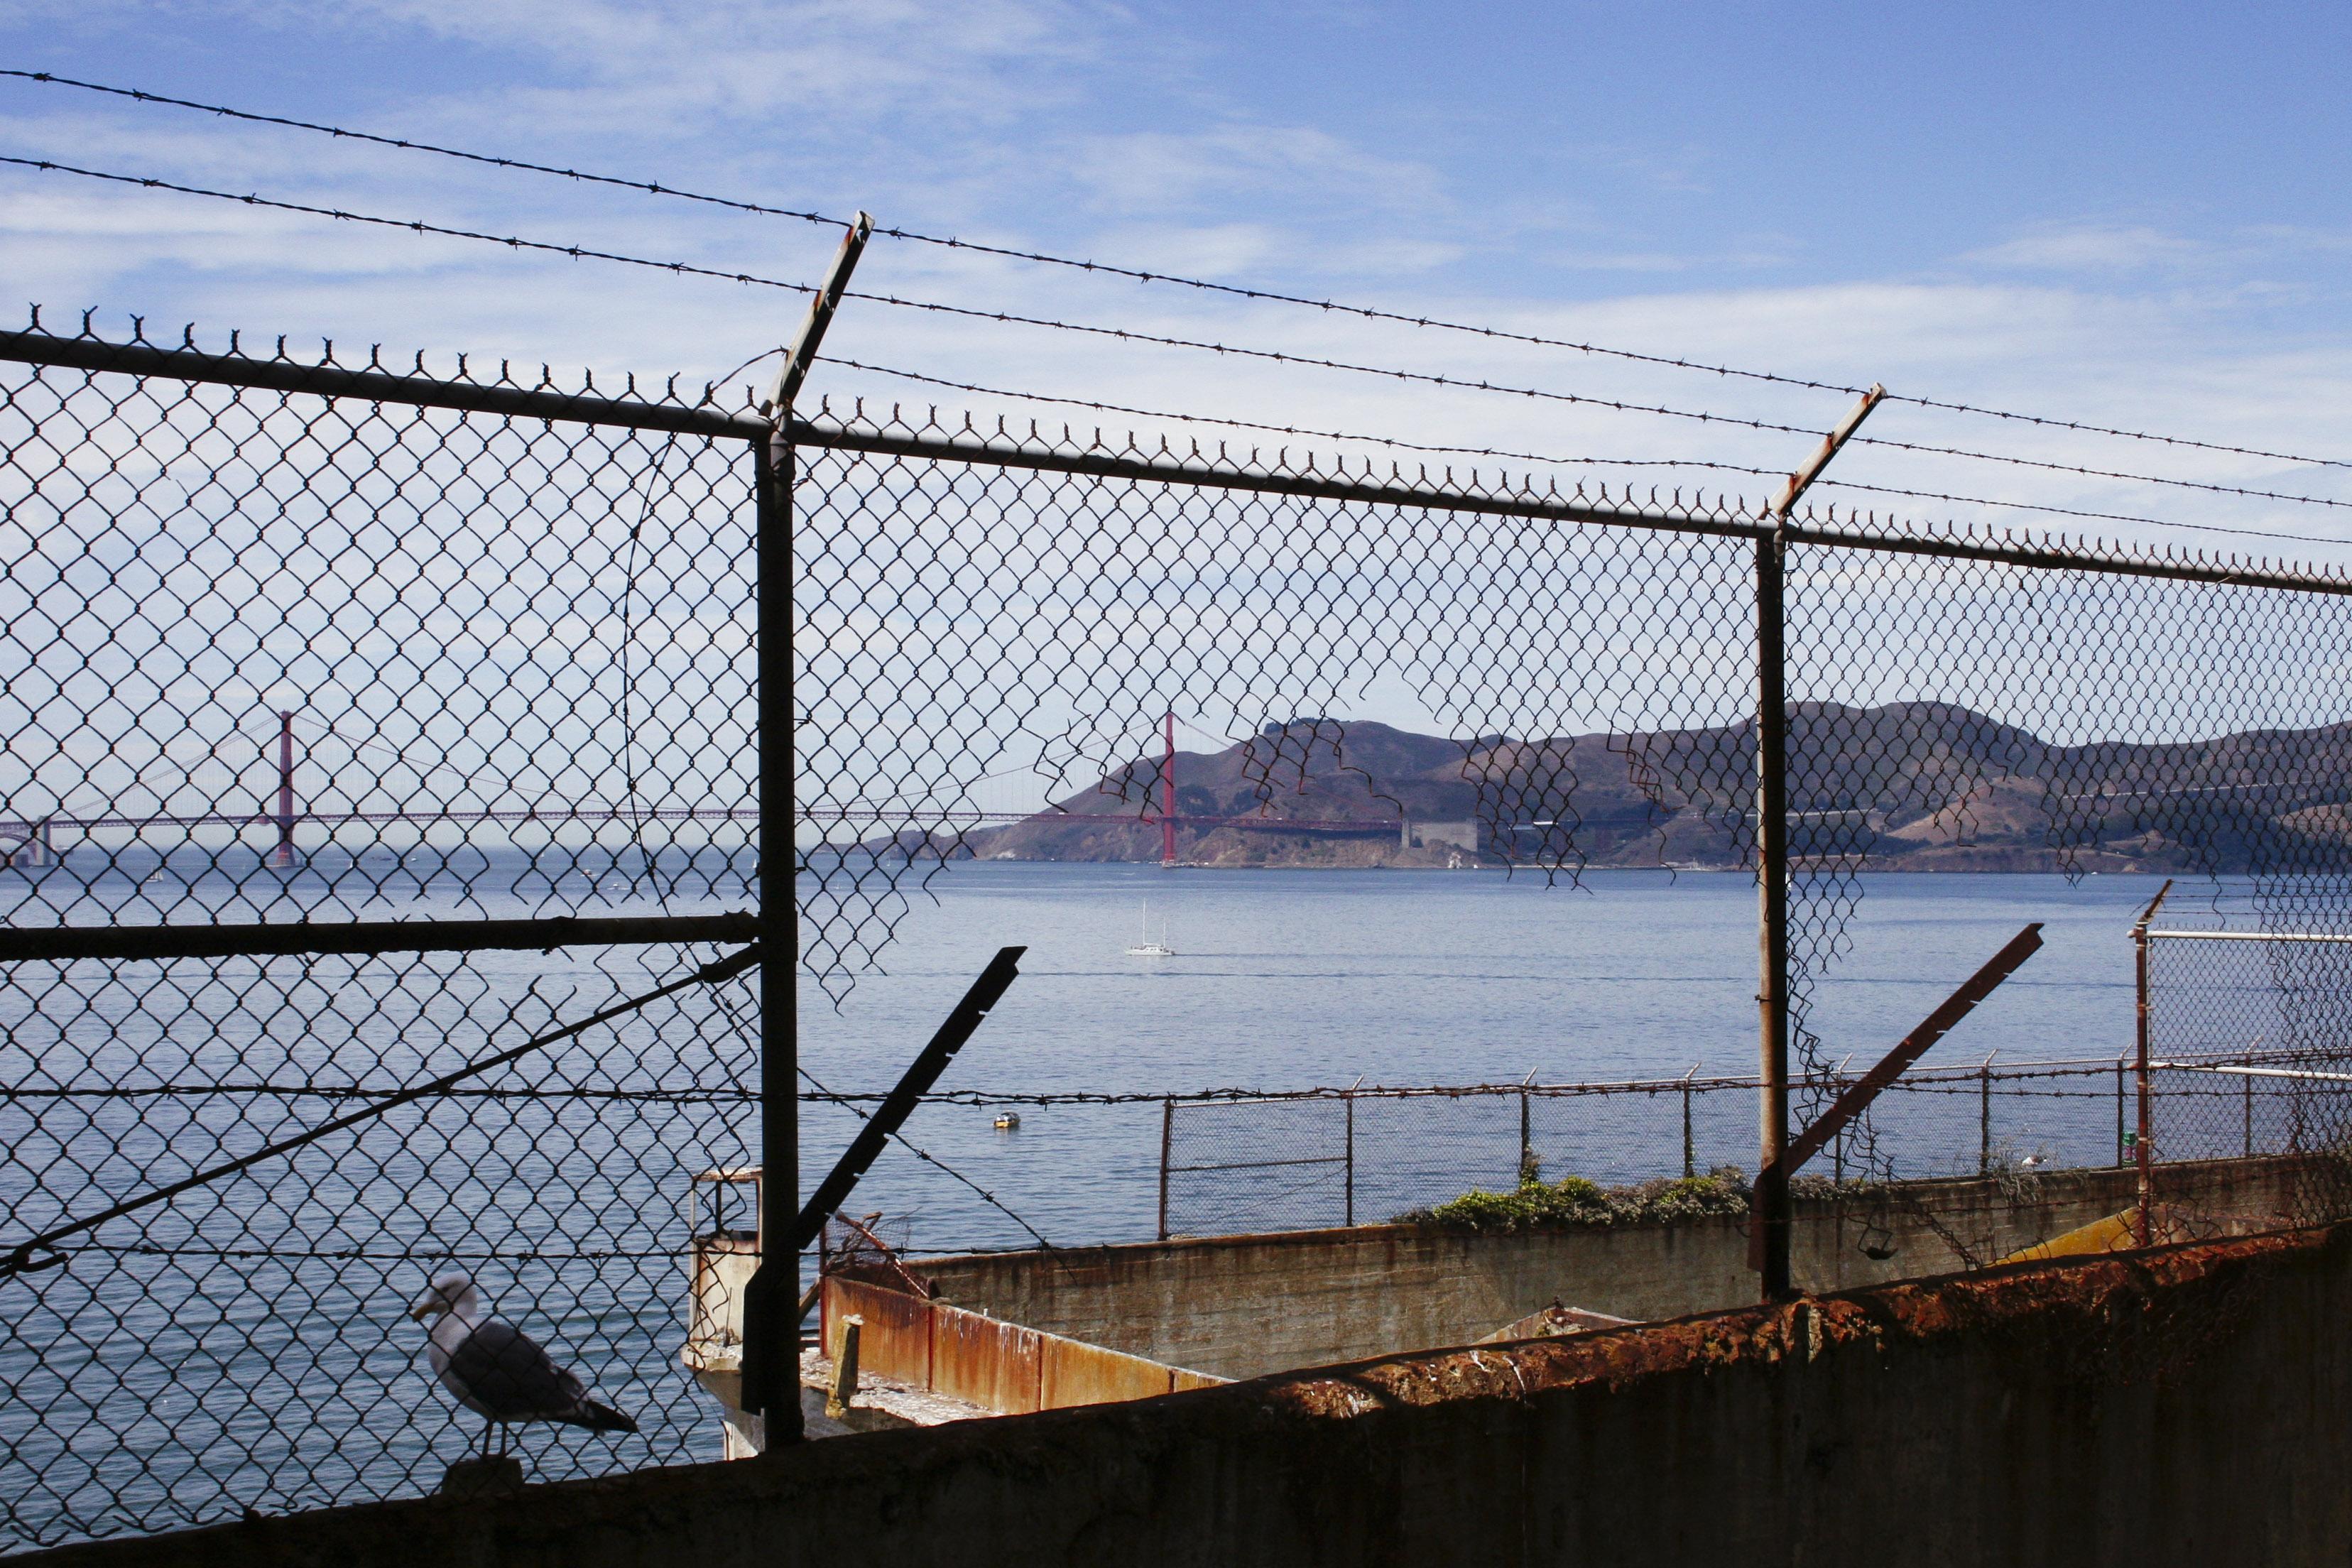 (c) Priscilla Stanley - Alcatraz